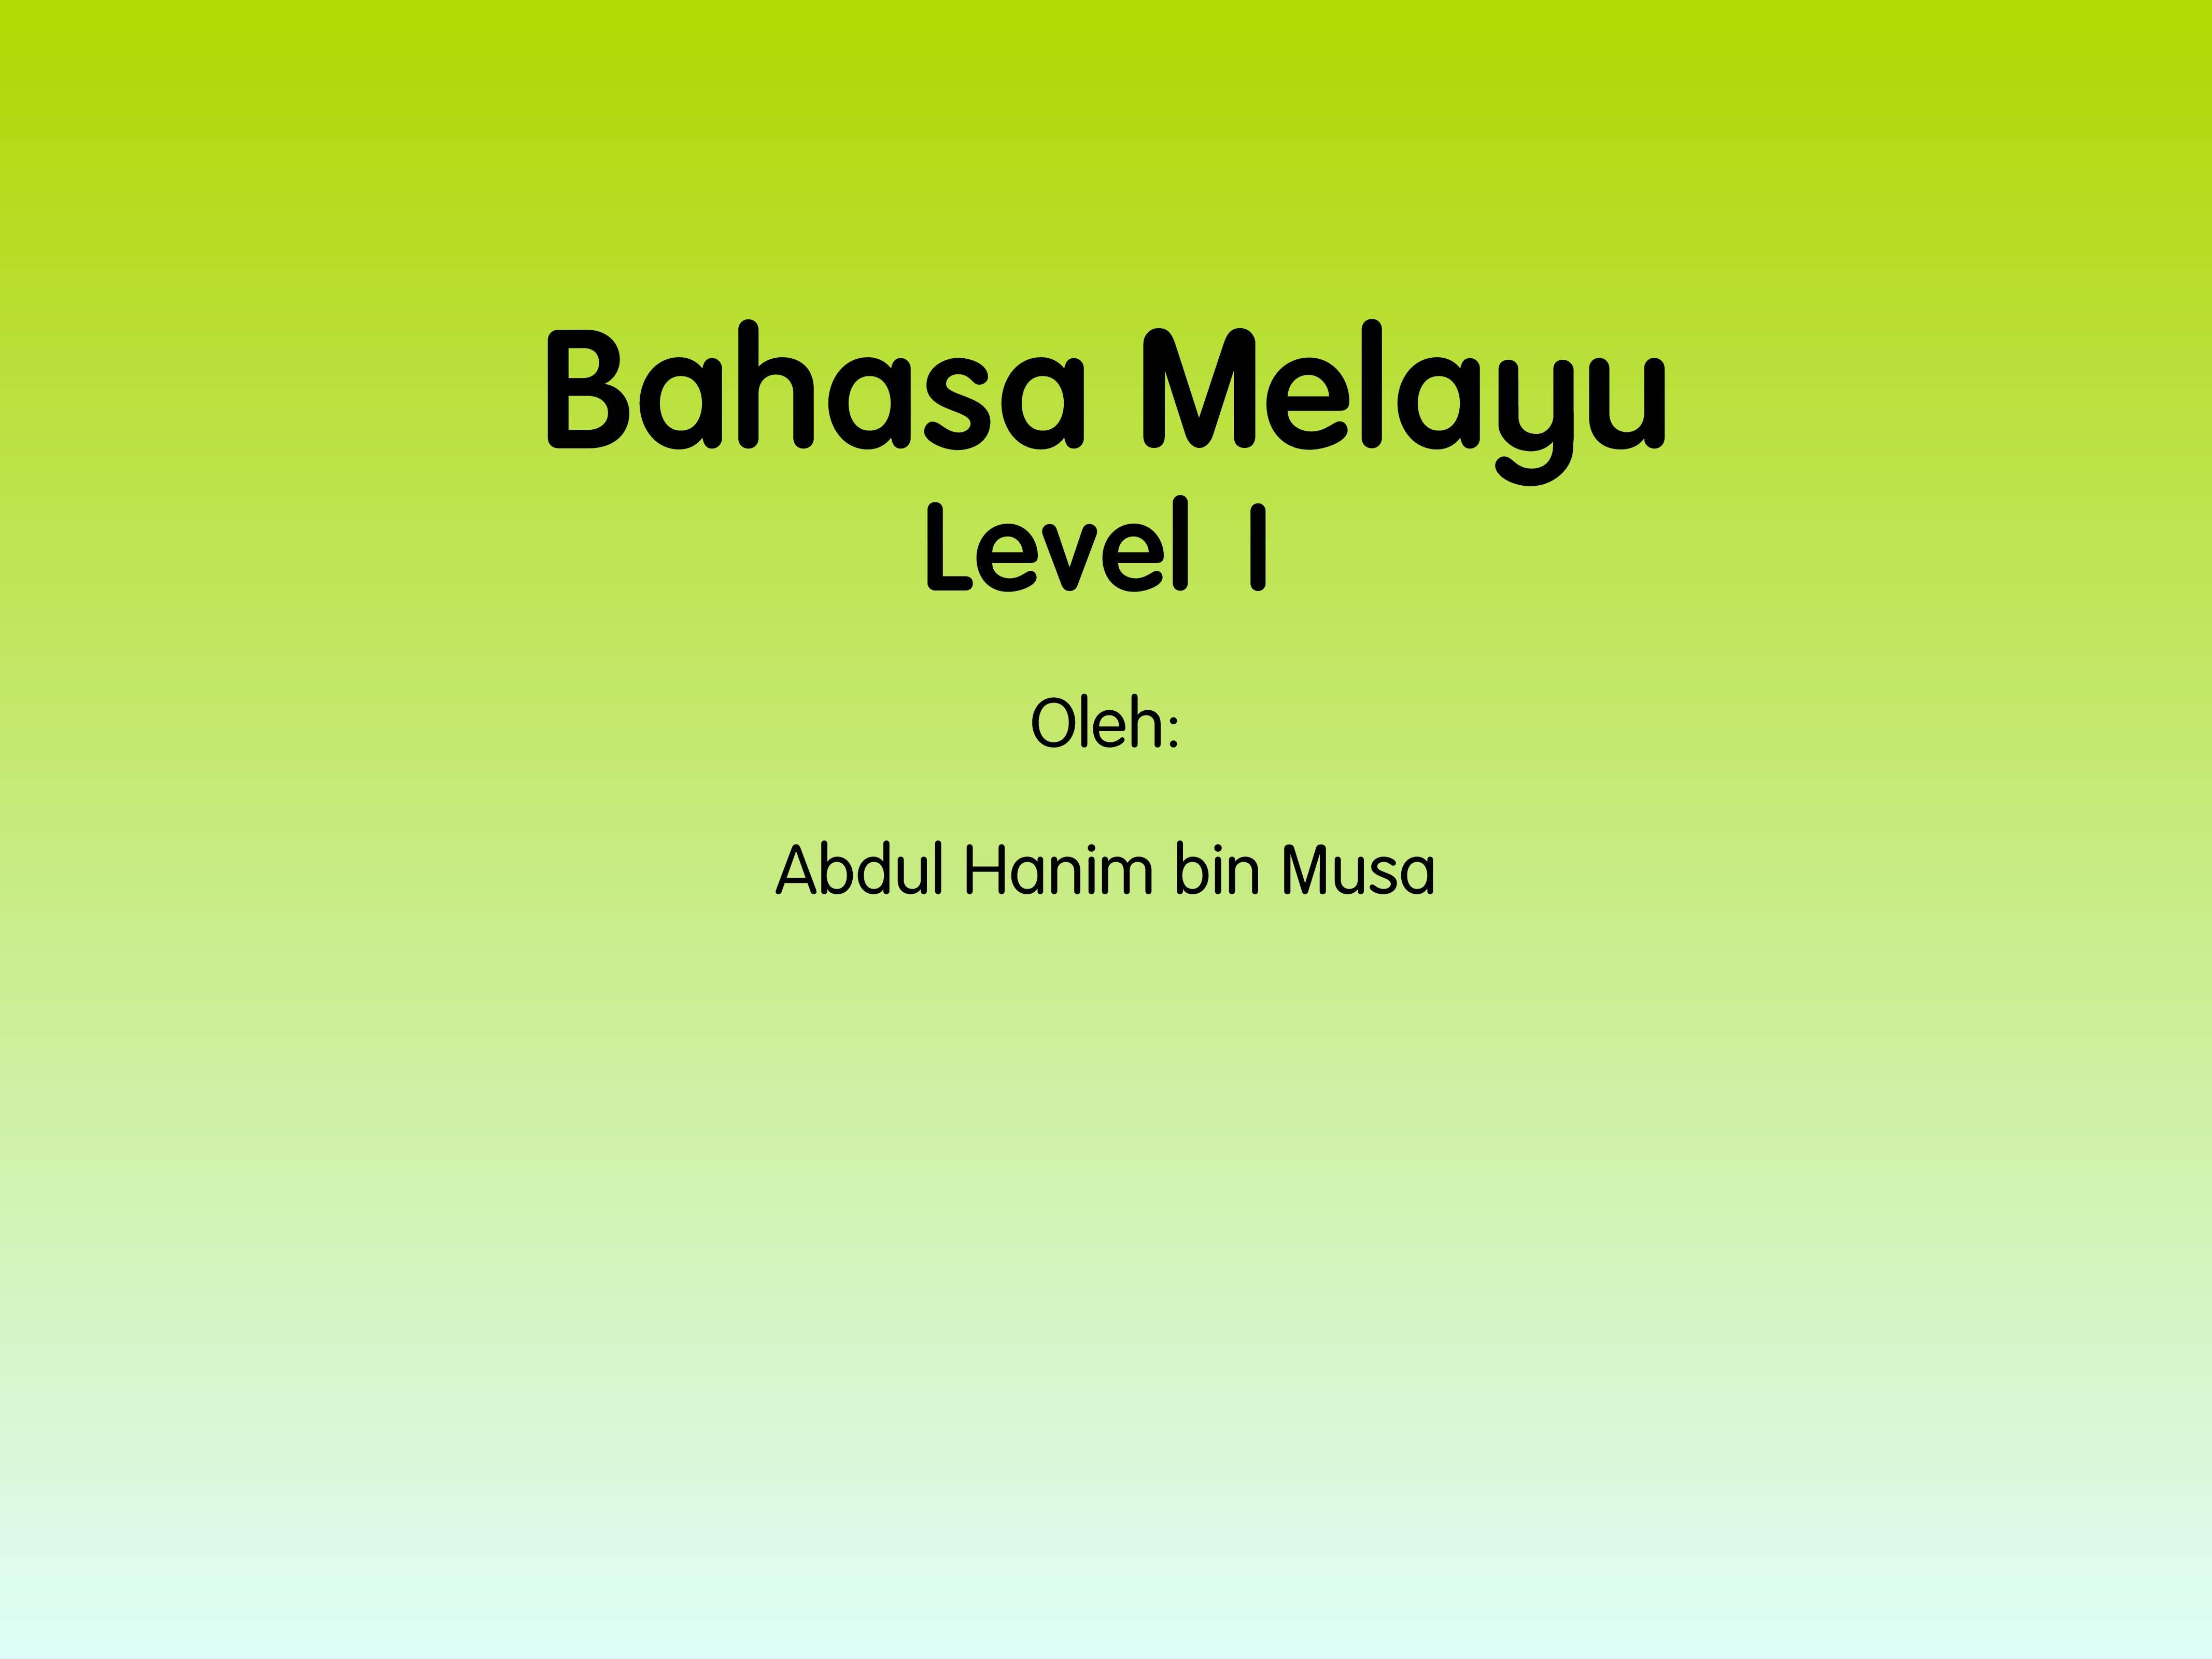 Tuition On Bahasa Melayu (Level 1)